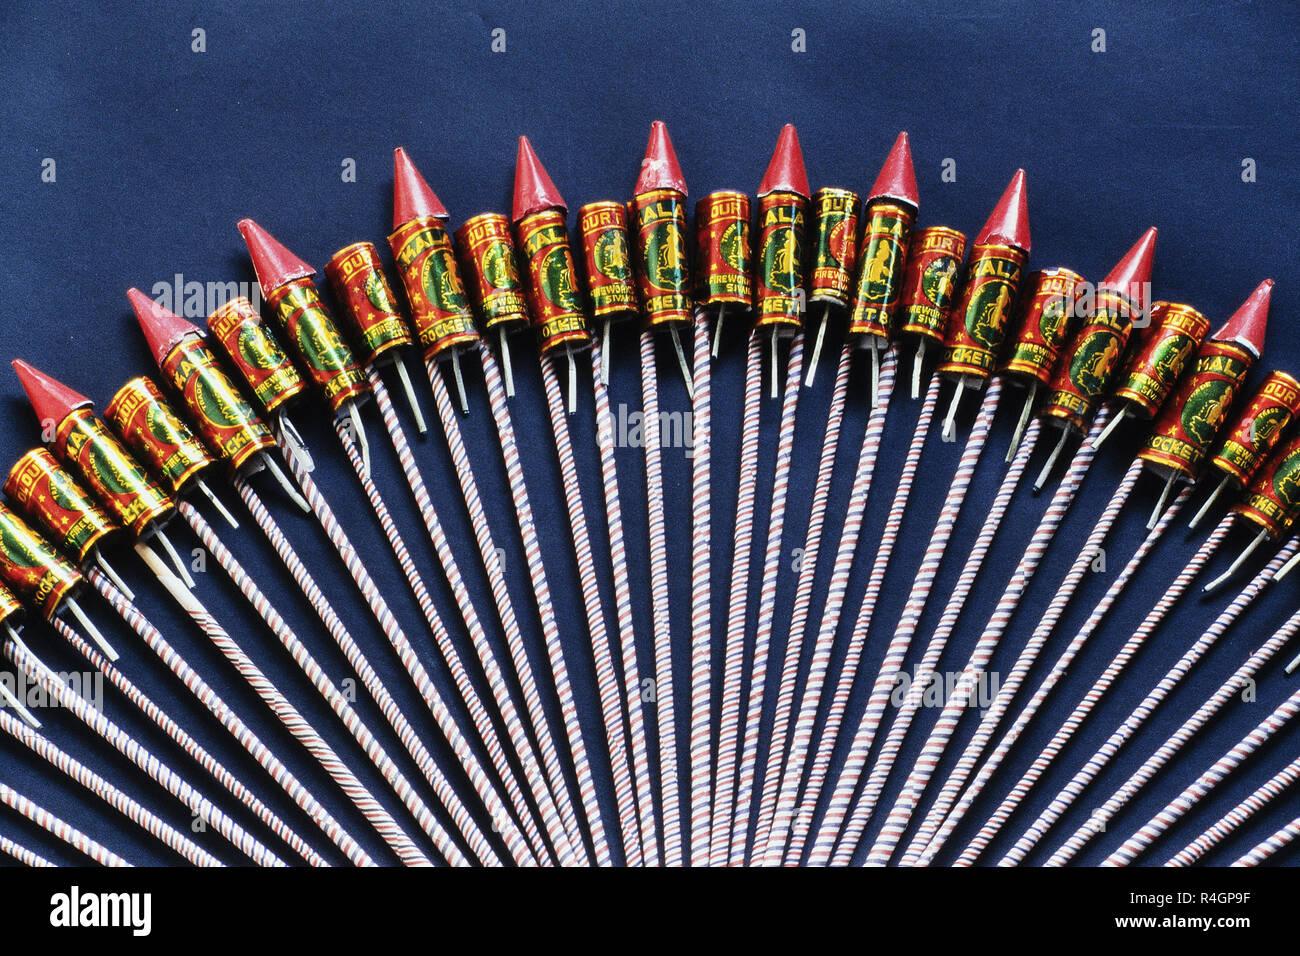 Firecracker Rockets for Diwali festival, Mumbai, India, Asia Stock Photo